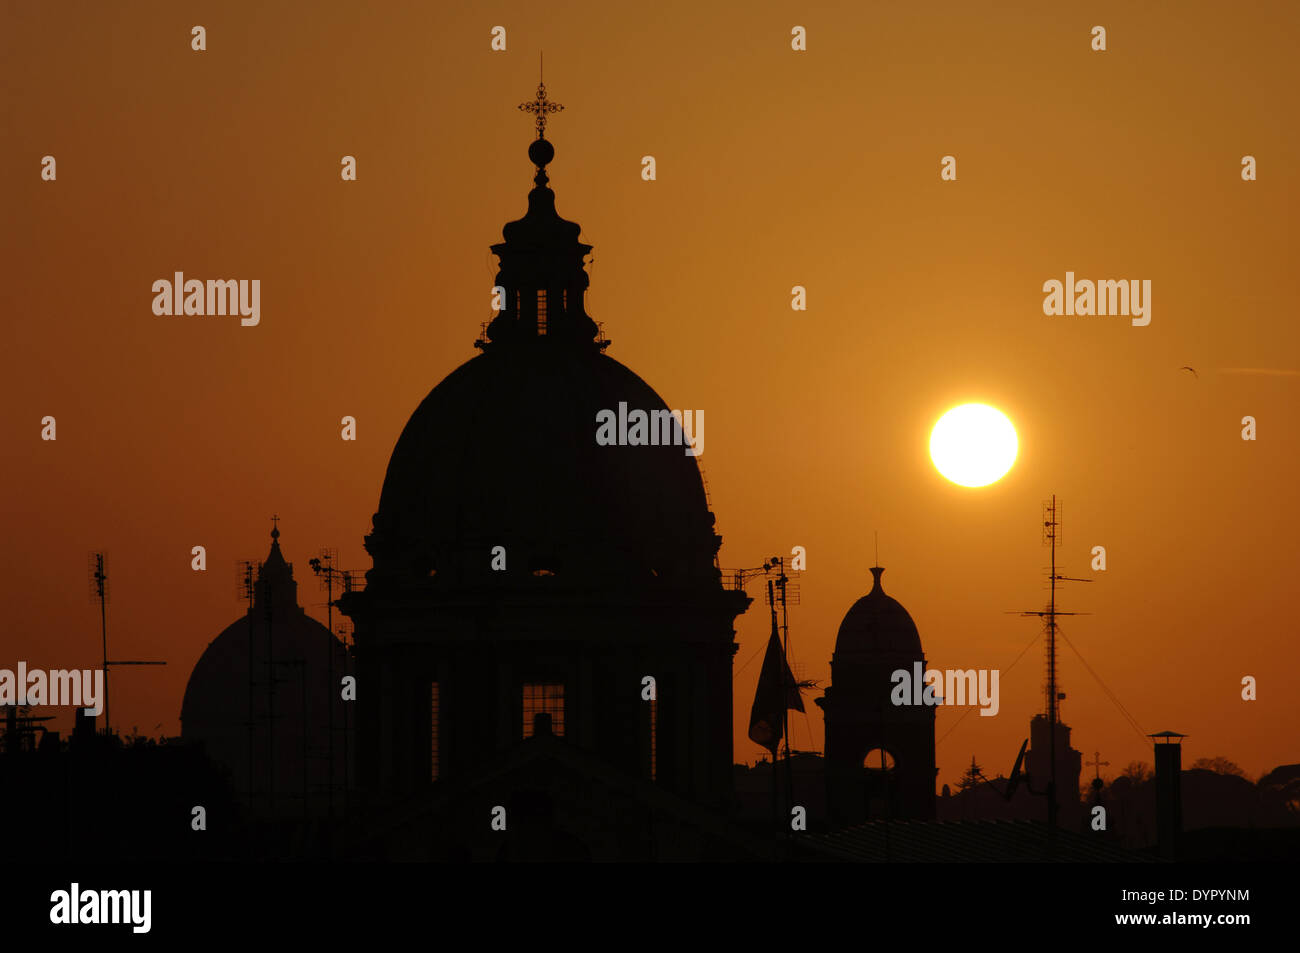 St Ambrose Stock Photos & St Ambrose Stock Images - Alamy